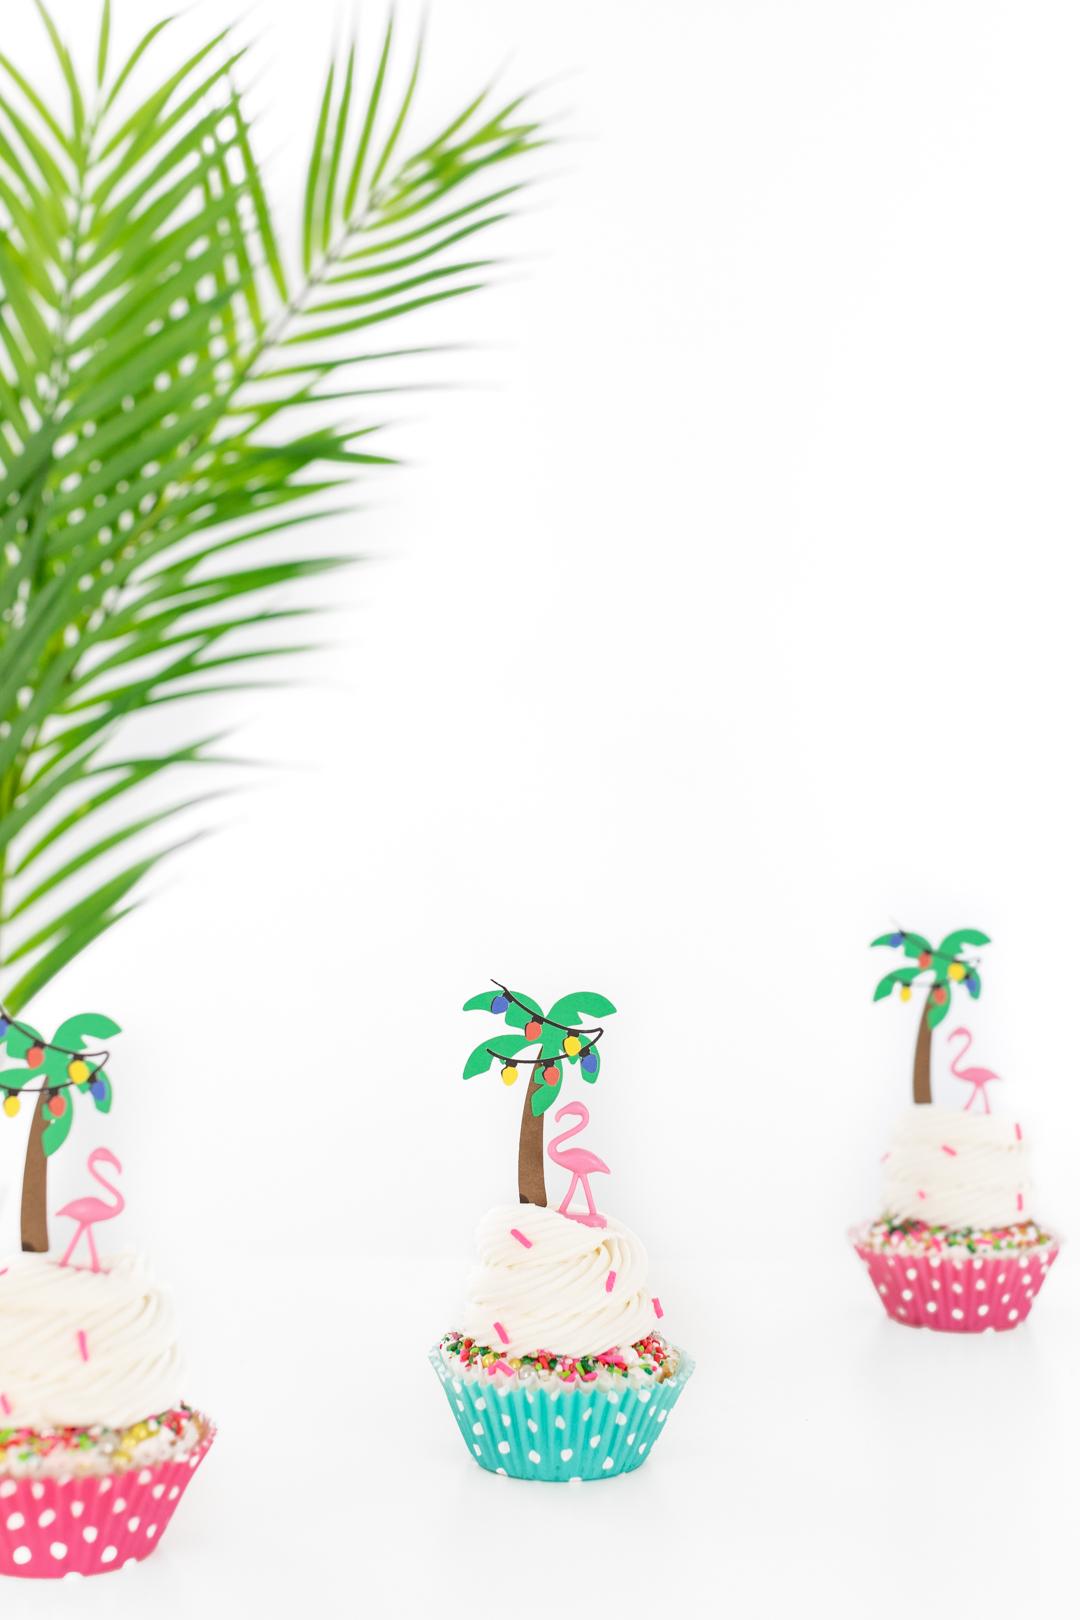 tropical christmas dessert idea with palm trees and flamingos